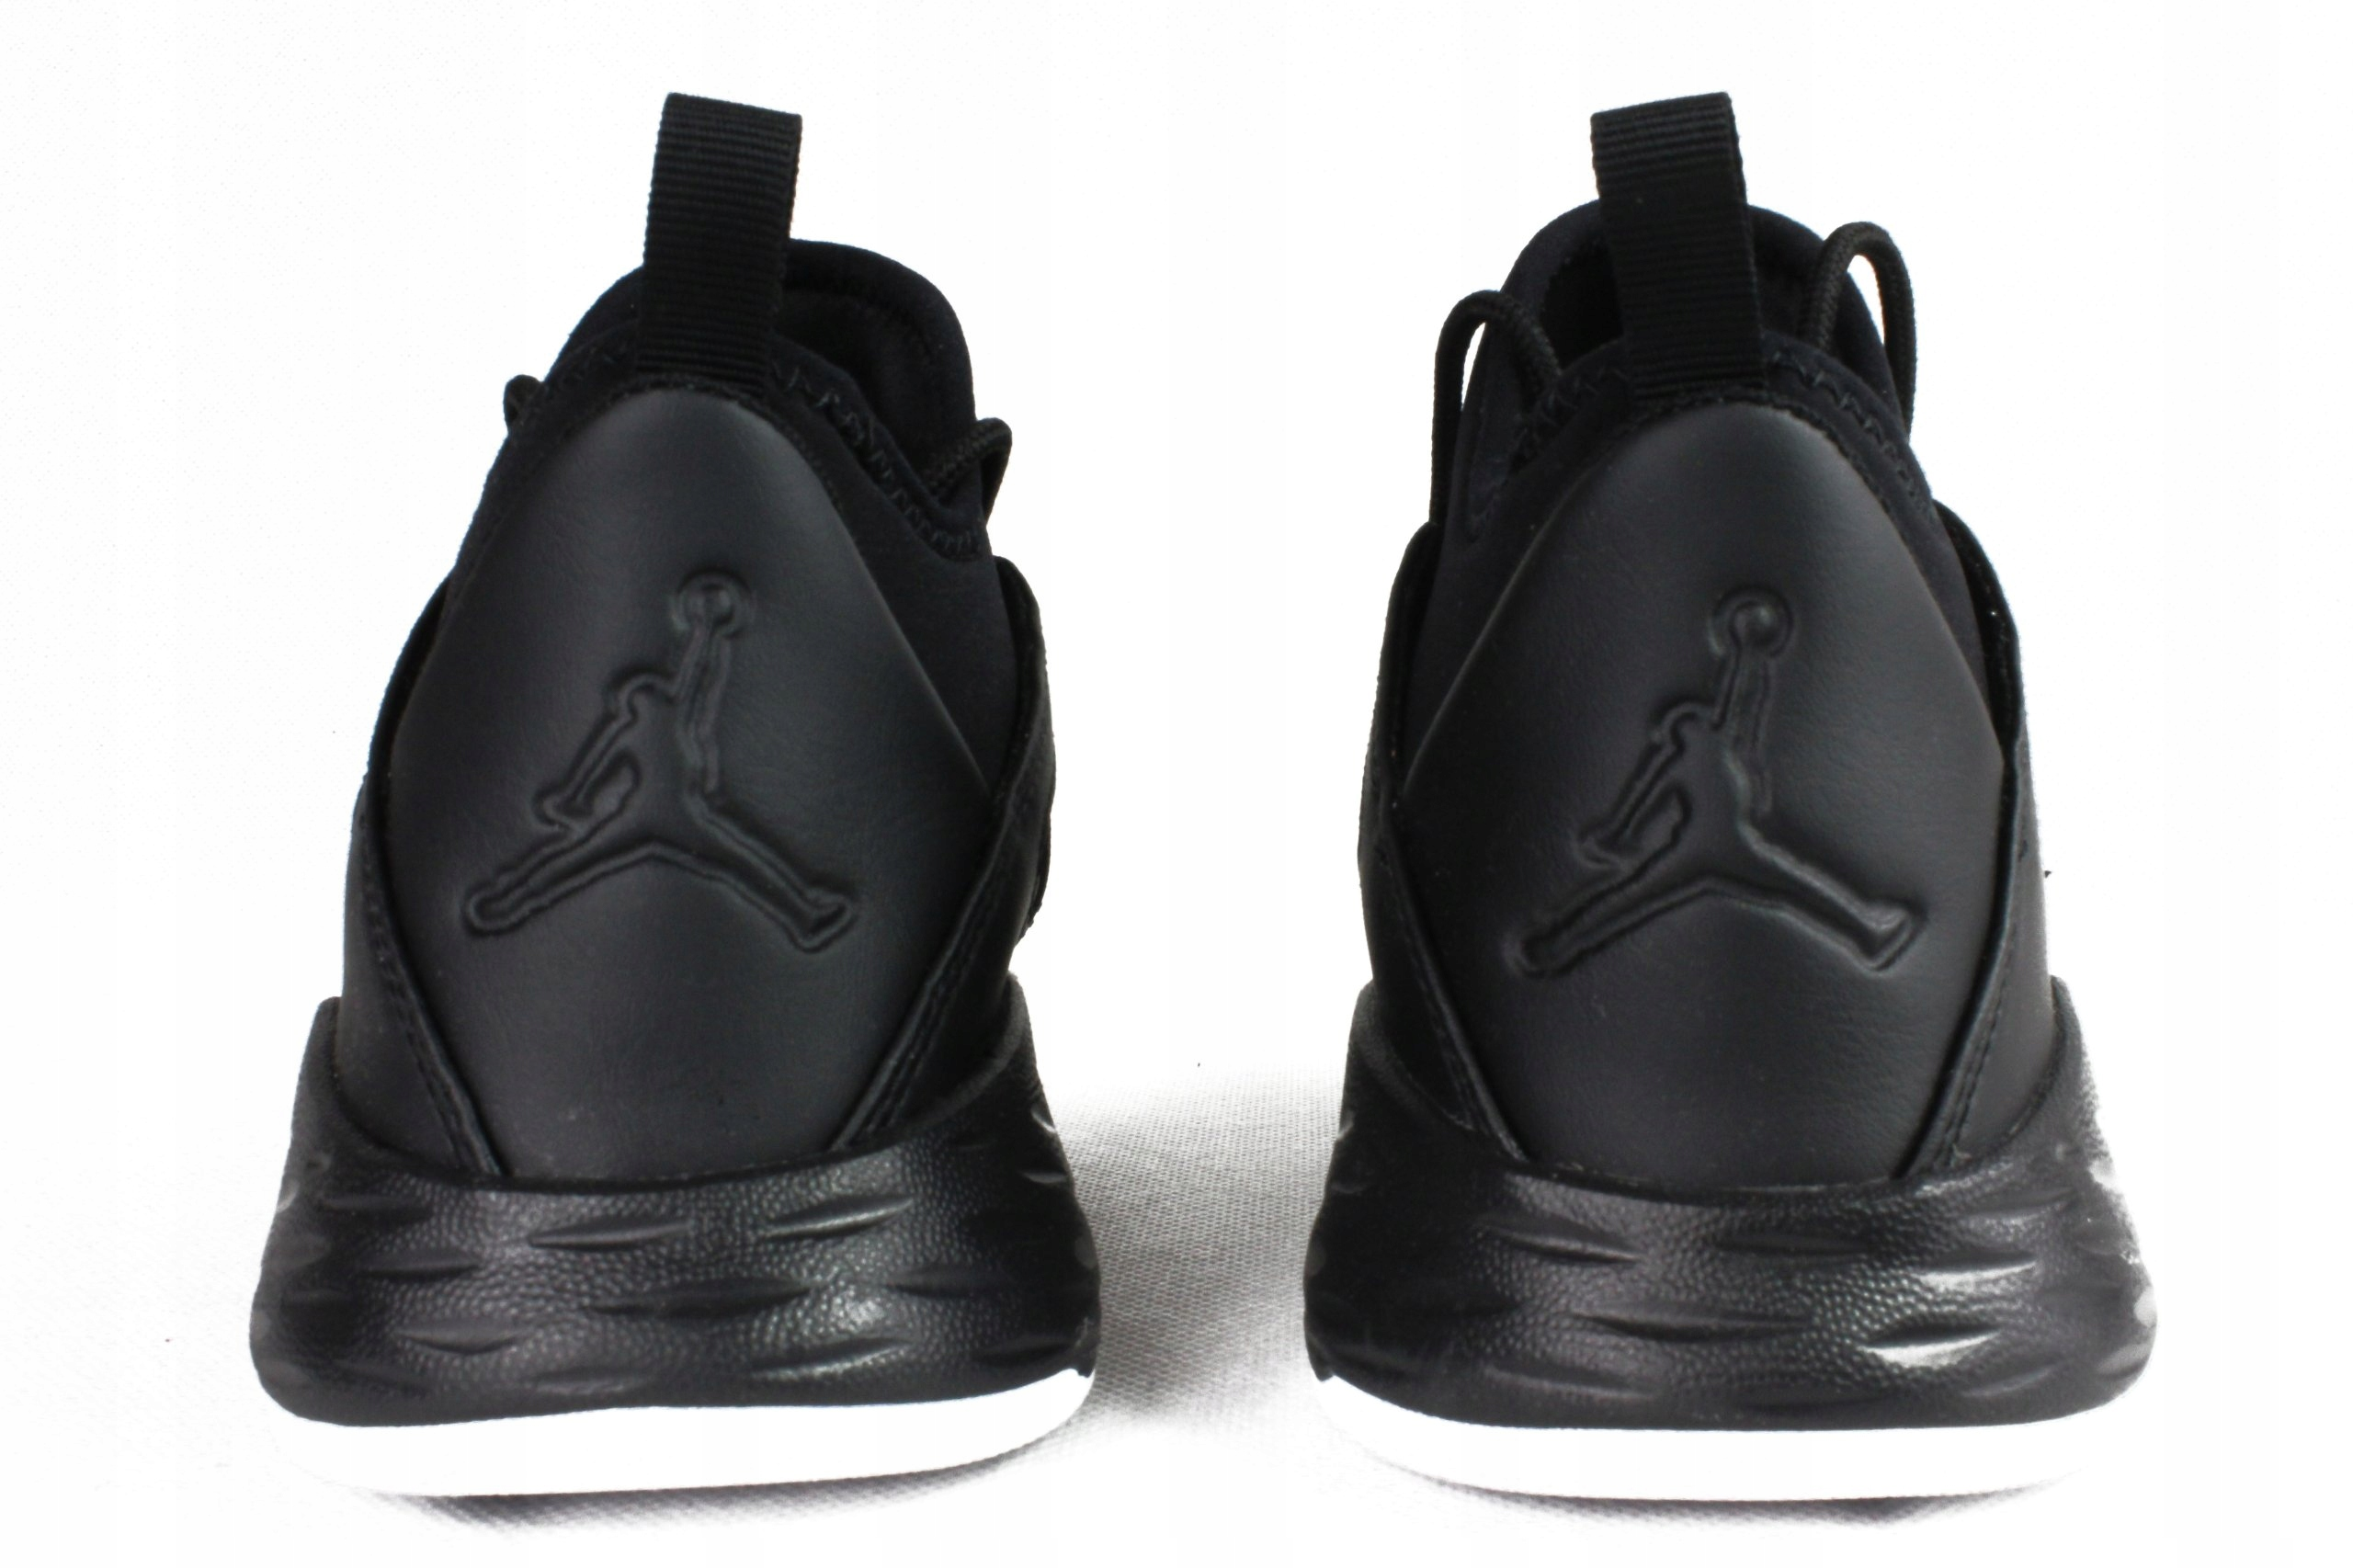 quality design c1512 540f2 Buty Nike Jordan Formula 23 r. 40,5 Kobe Lebron Kd (7198377575)